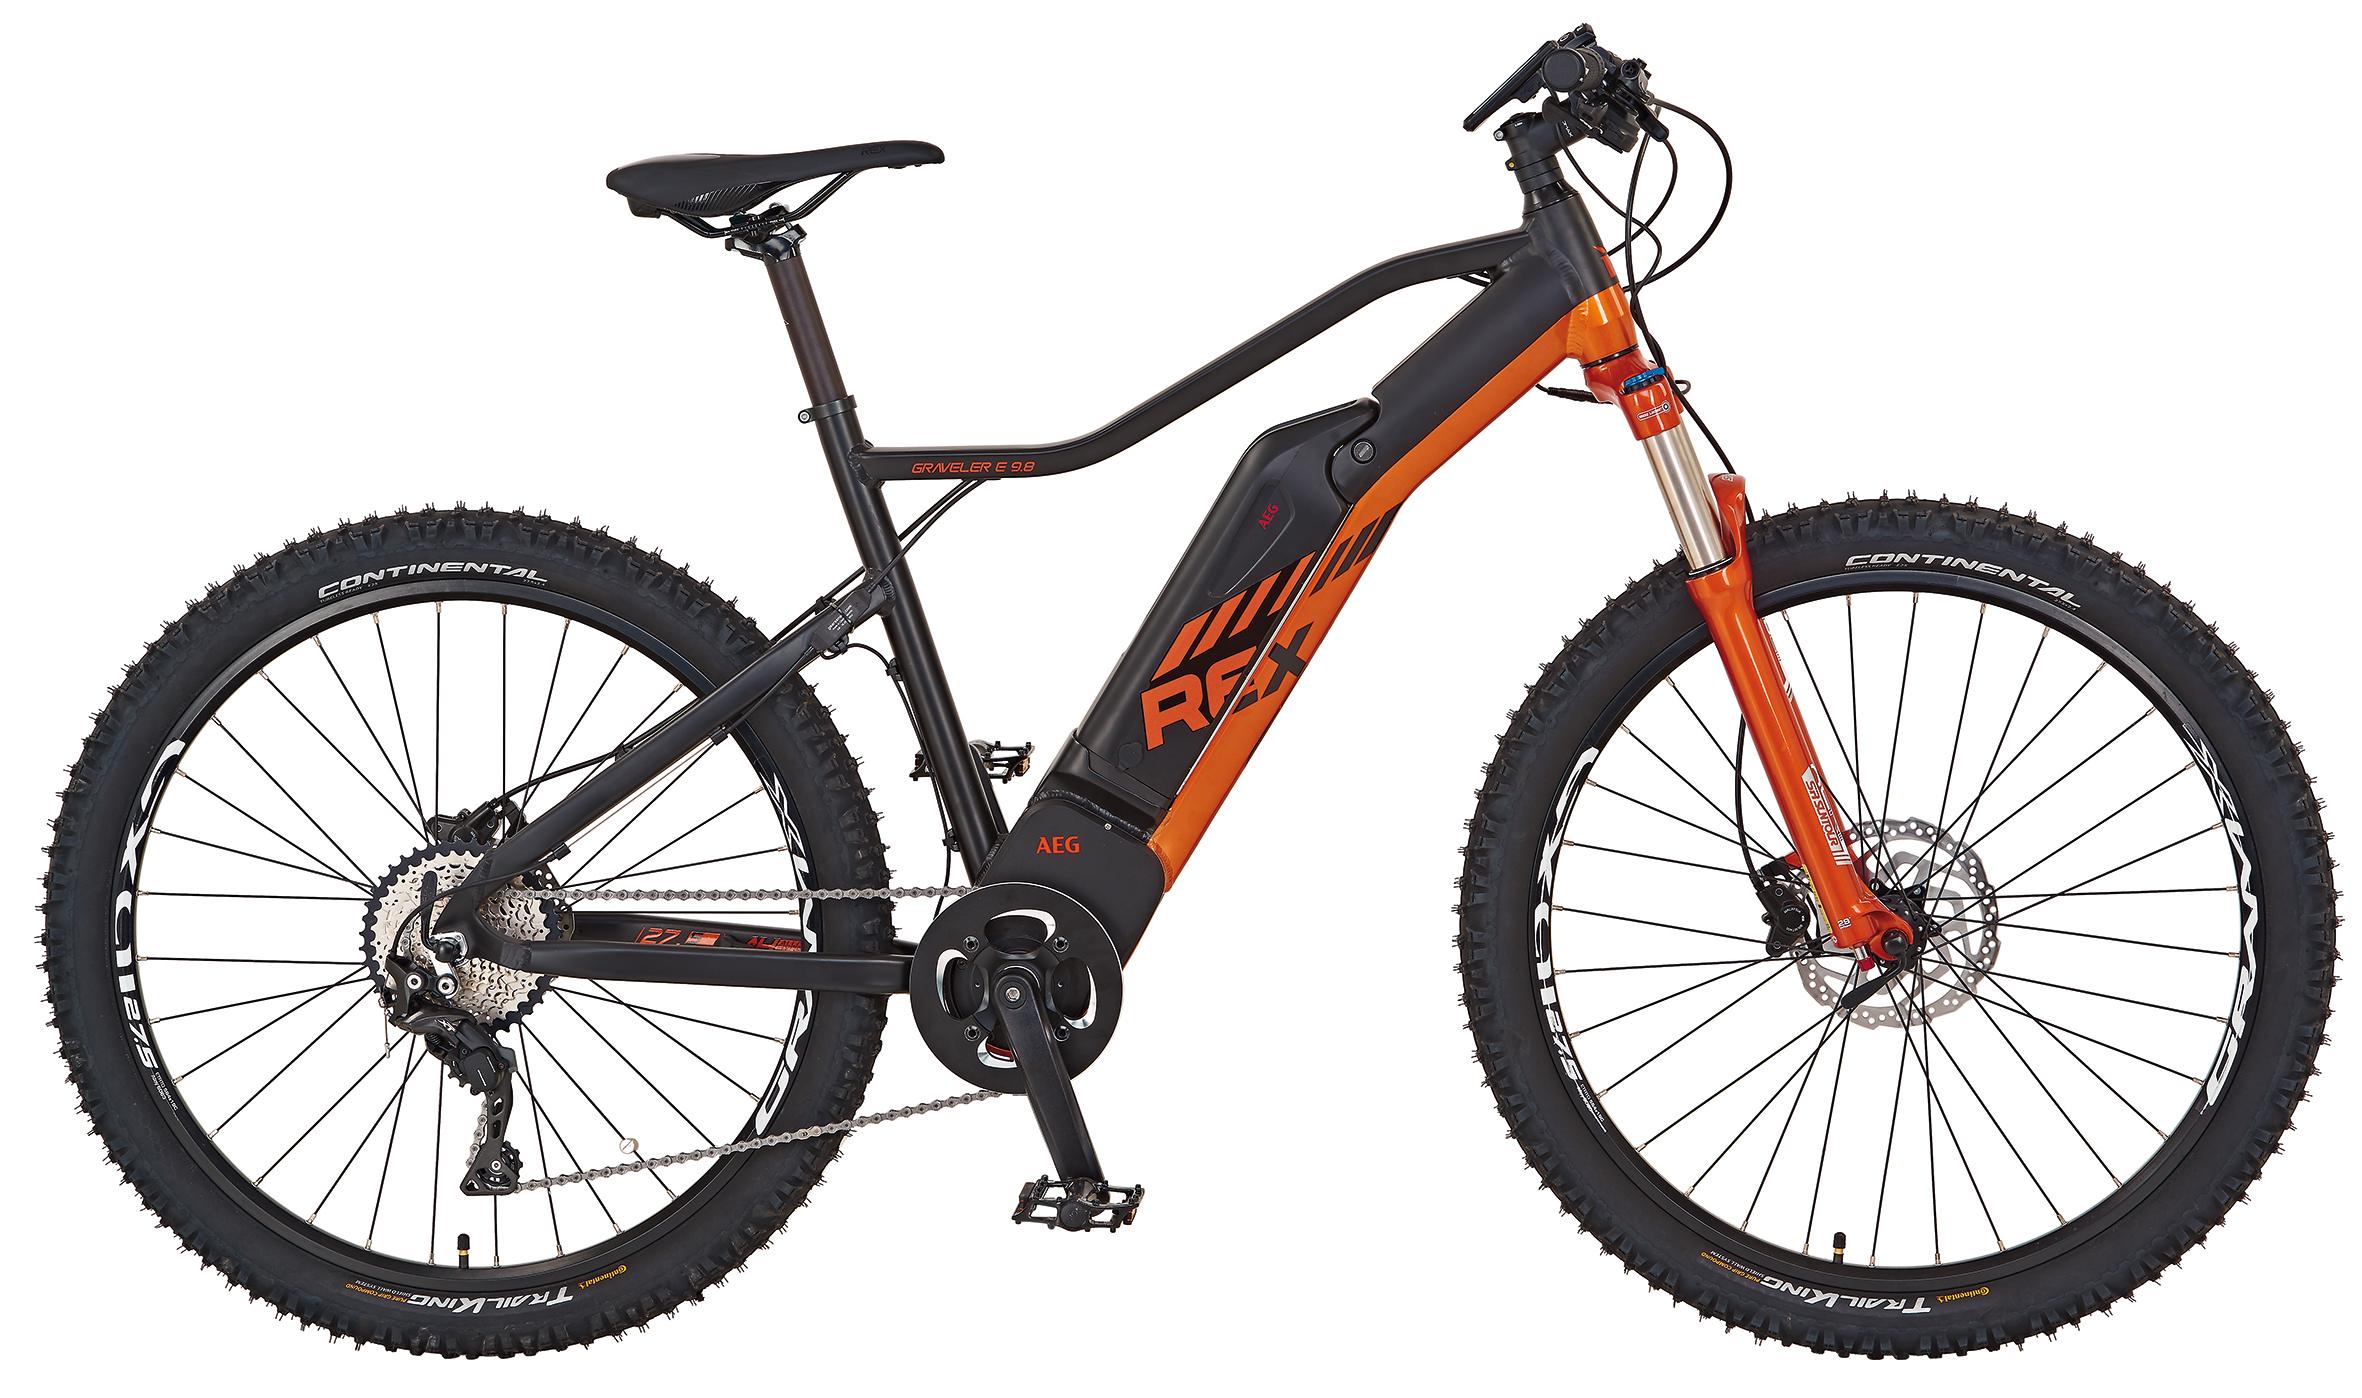 "Rex Bike Elektrofahrrad / E-Mountainbike Graveler e9.8 E-MTB 27,5"" Bild 1"